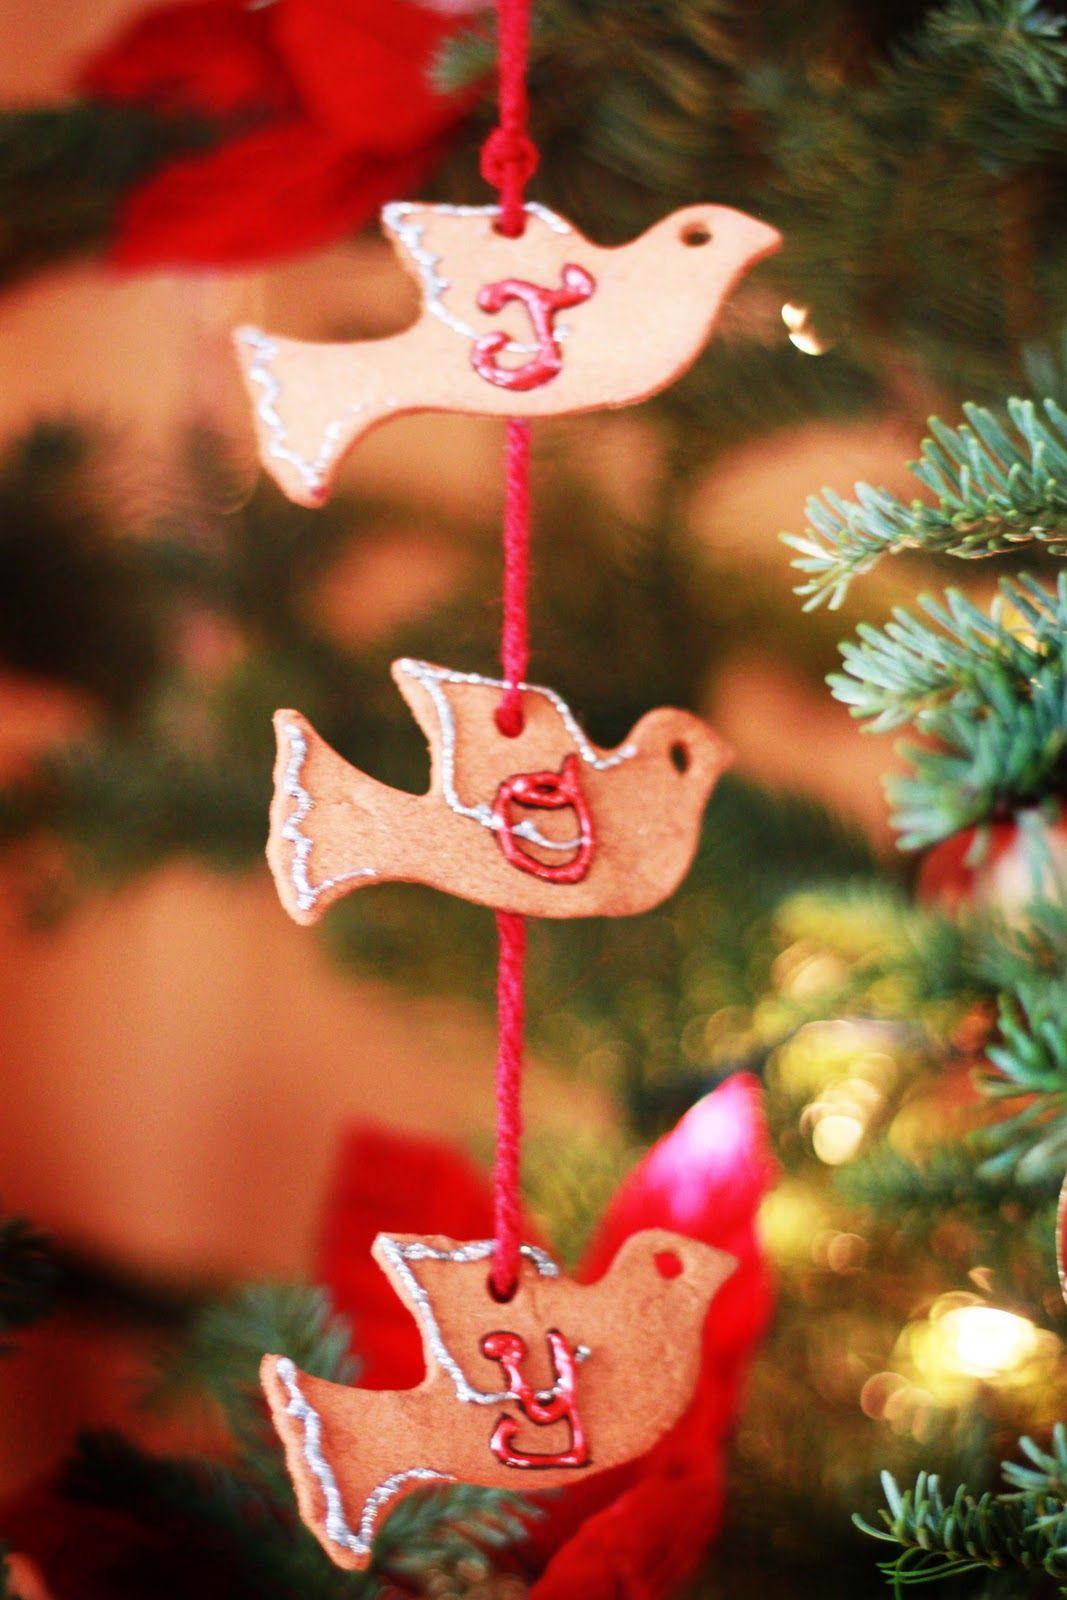 Creative Juices Decor Cinnamon Elmers Glue Ornaments Diy Christmas Ornaments Christmas Arts And Crafts Christmas Ornaments